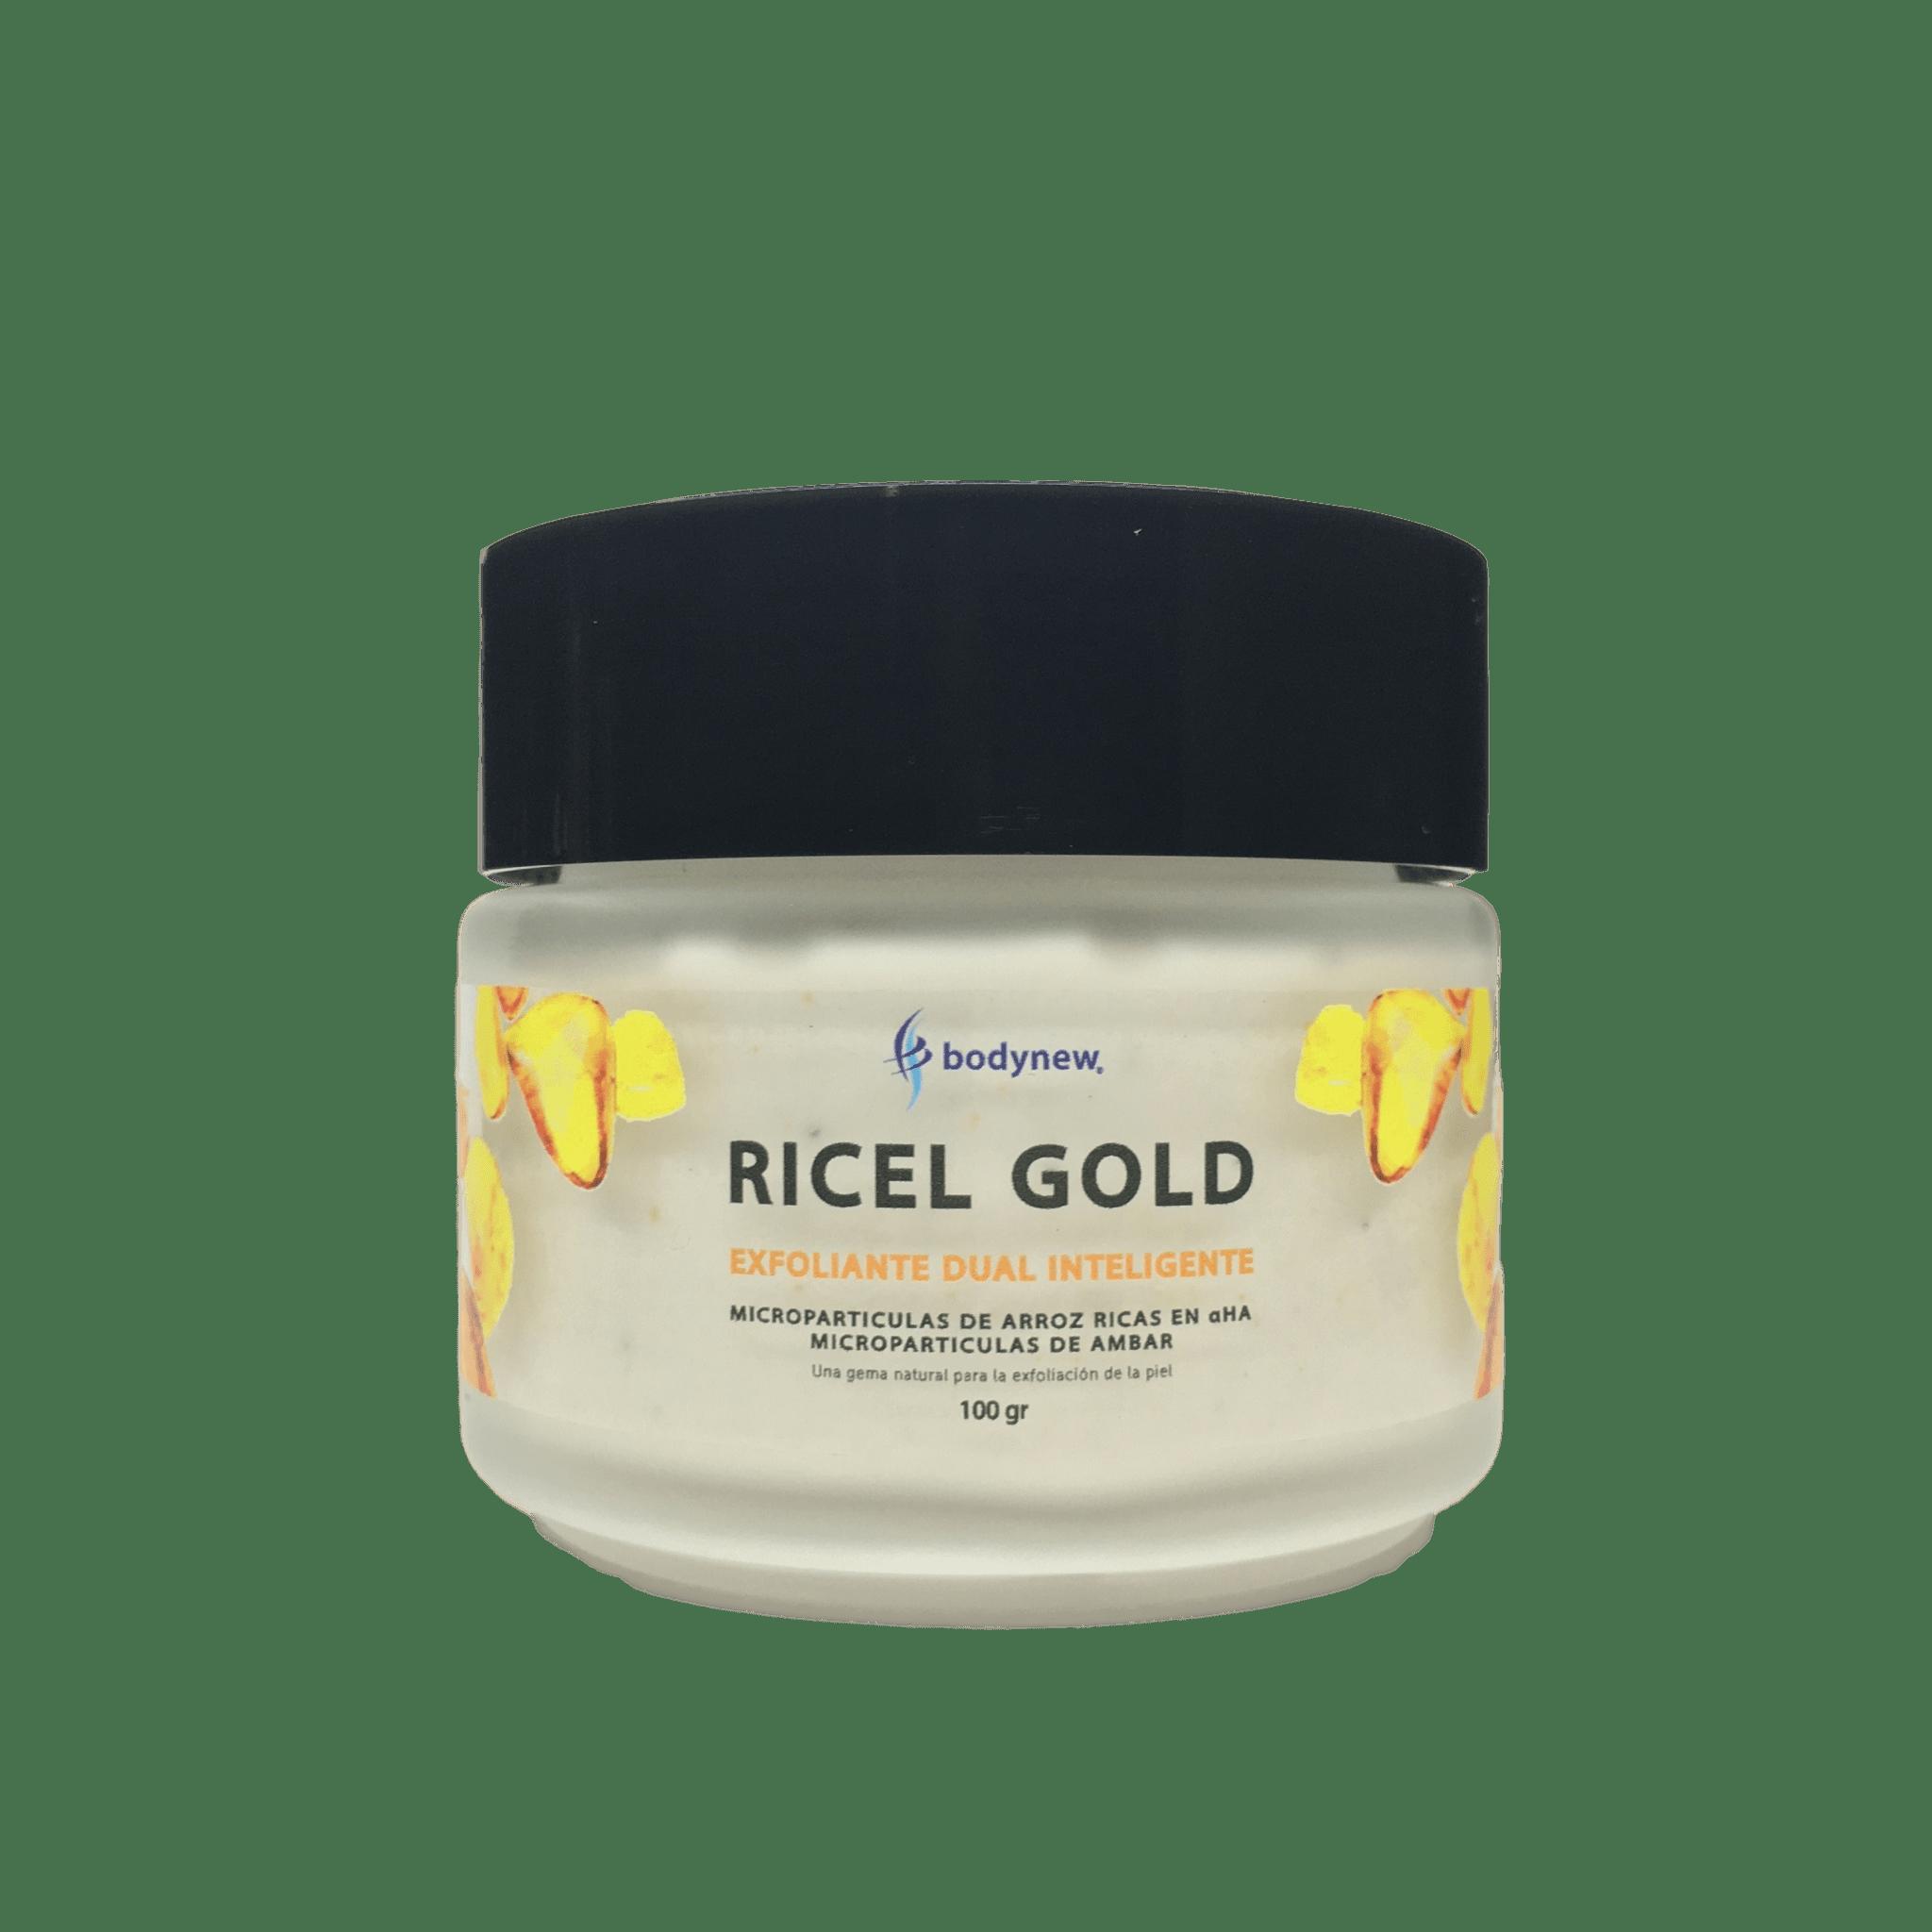 RICEL GOLD